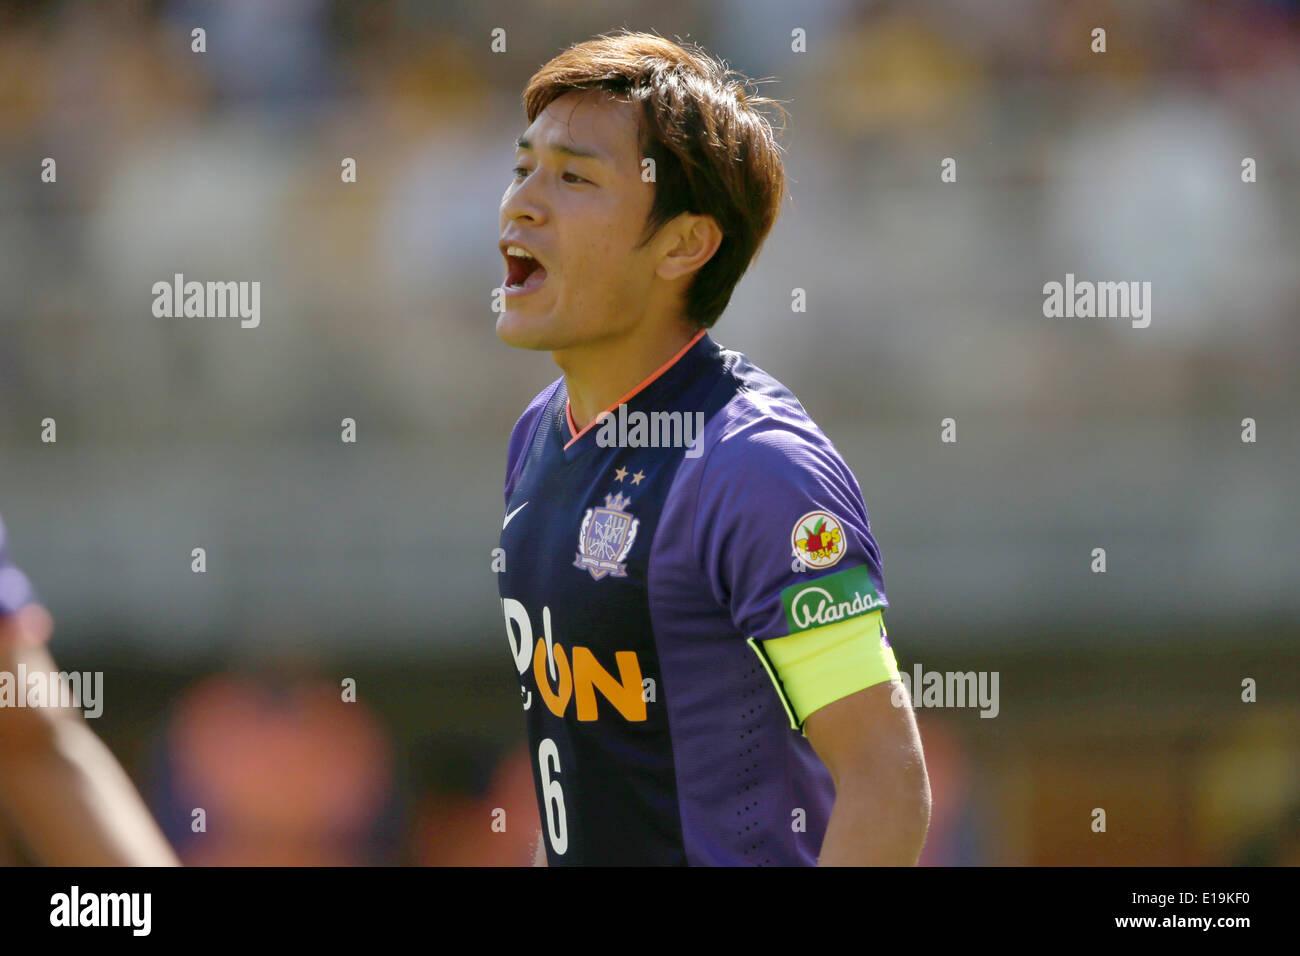 Toshihiro Aoyama (Sanfrecce), MAY18, 2014 - Football/Soccer : 2014 J.League Division 1, between Vegalta Sendai 1-0 Sanfrecce Hiroshima at Yurtec Stadium Sendai, Miyagi, Japan. © Jun Tsukida/AFLO SPORT/Alamy Live News - Stock Image